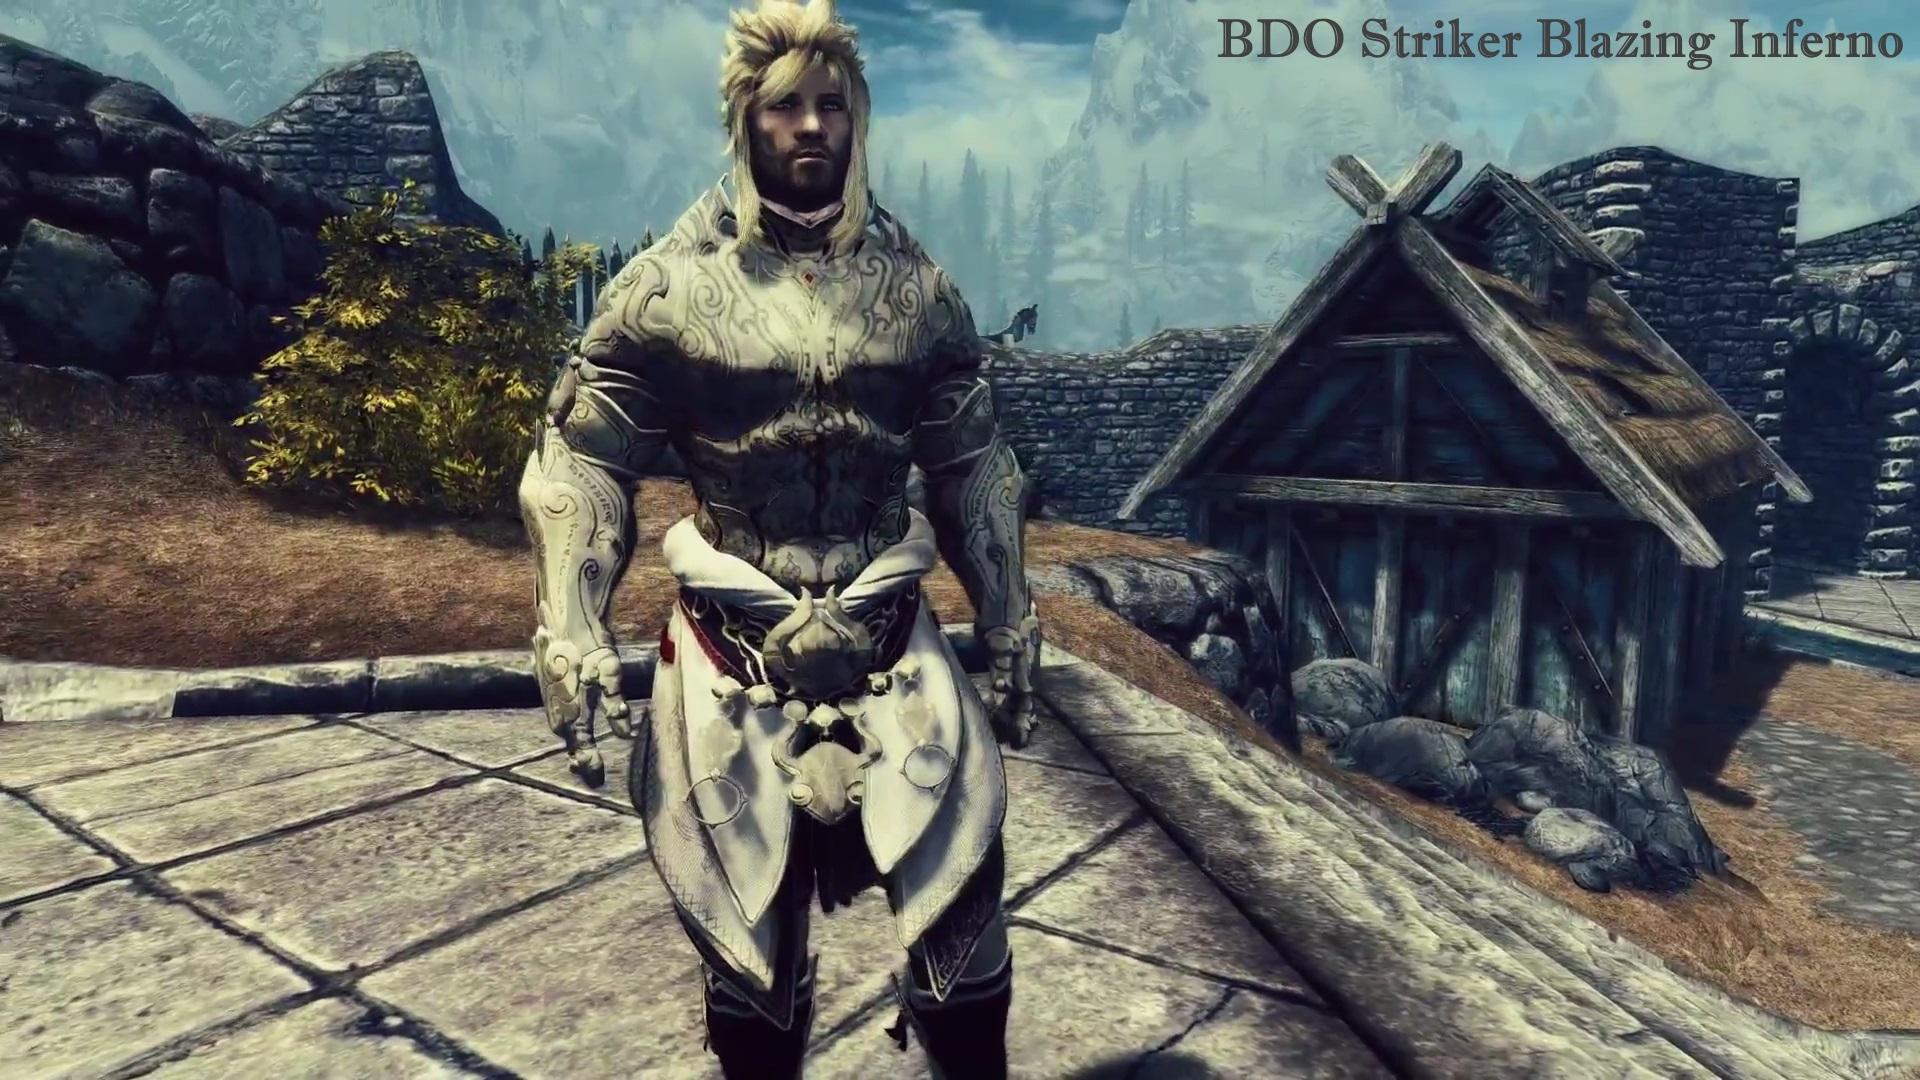 BDO Striker BlazingInfern.jpg